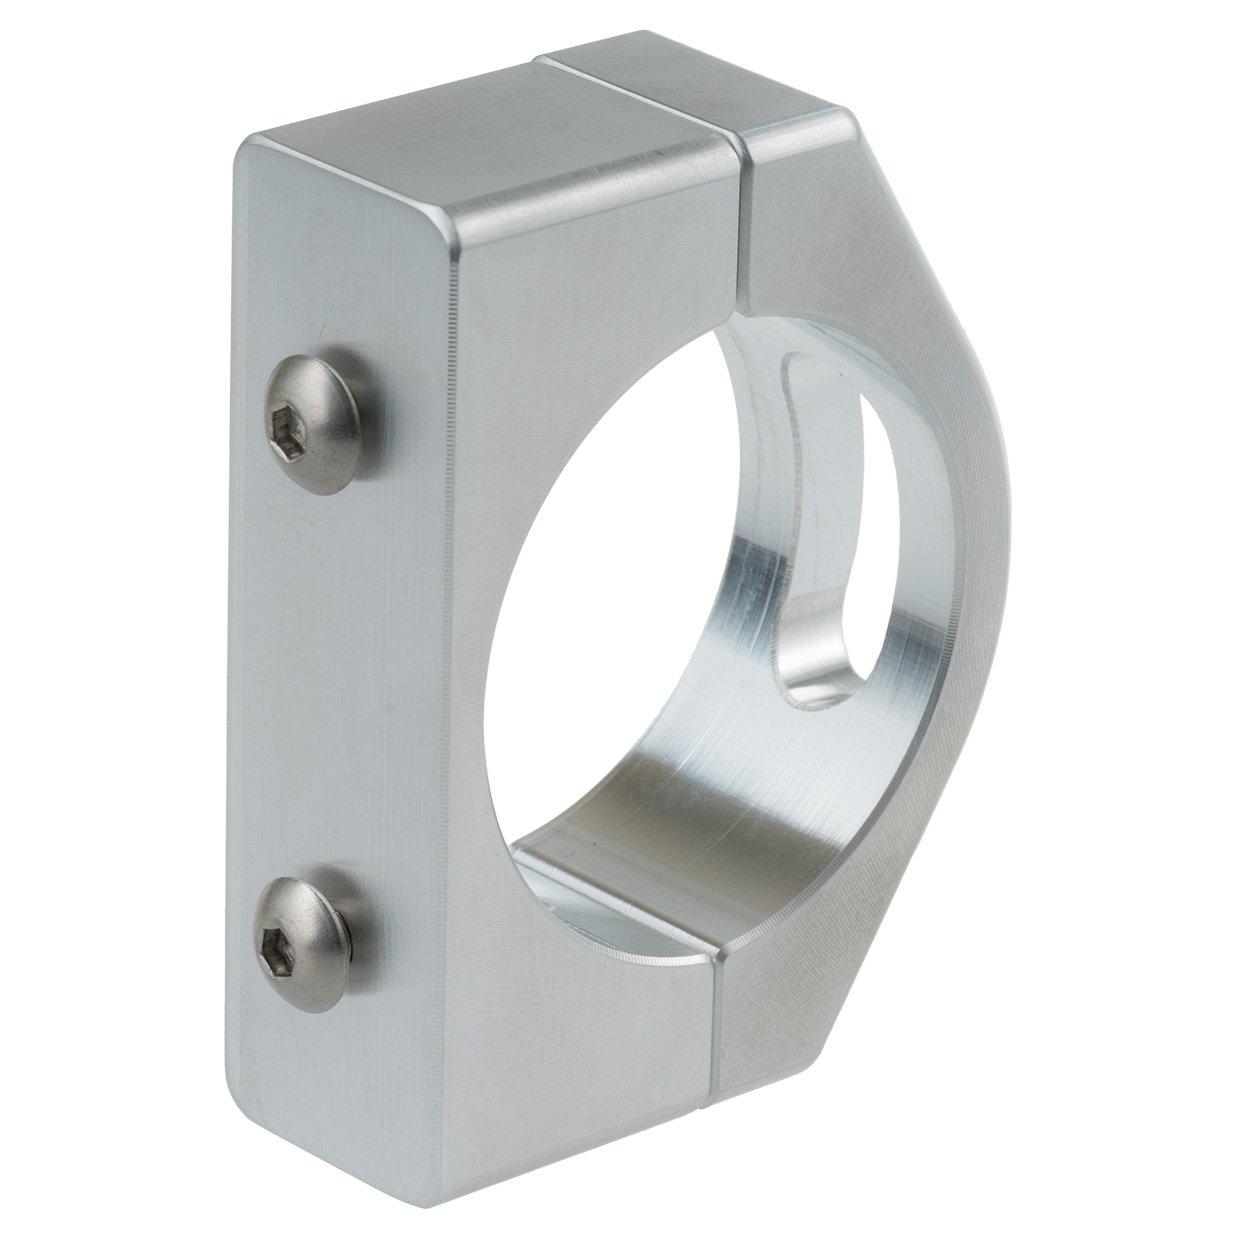 Tube Accessory Clamp Silver Joker Machine 60-130-4 1 3//4in